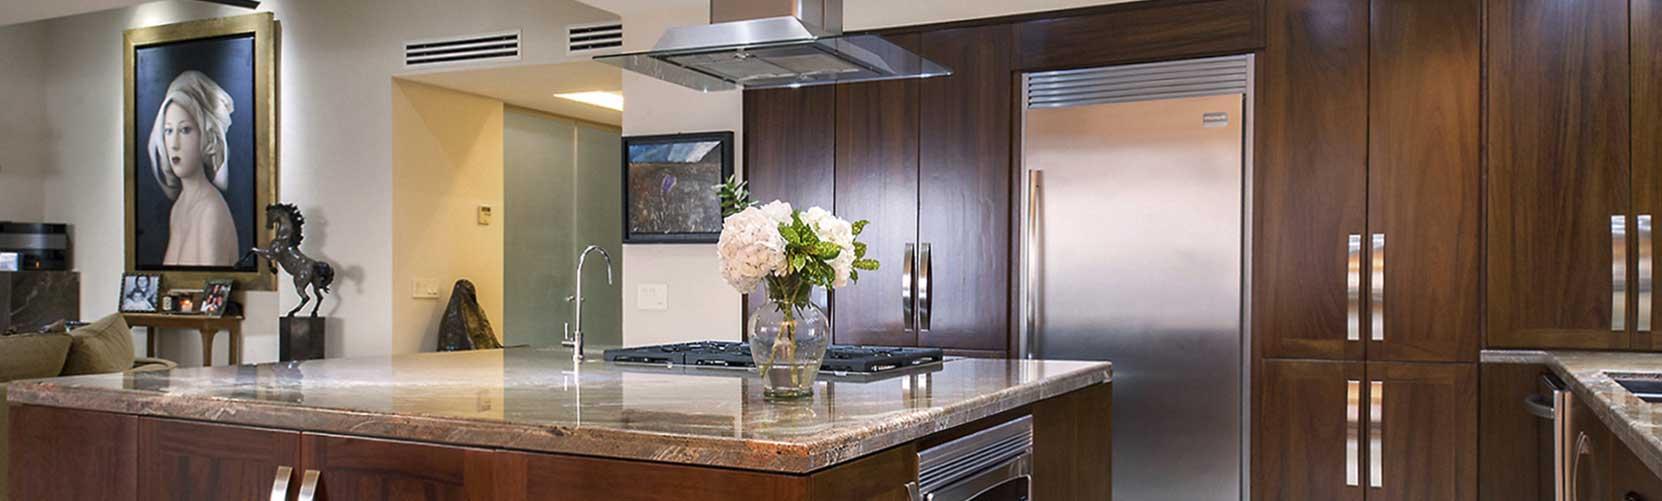 Apartment Molino De Agua 602 Interior Decore # Muebles Nayarit